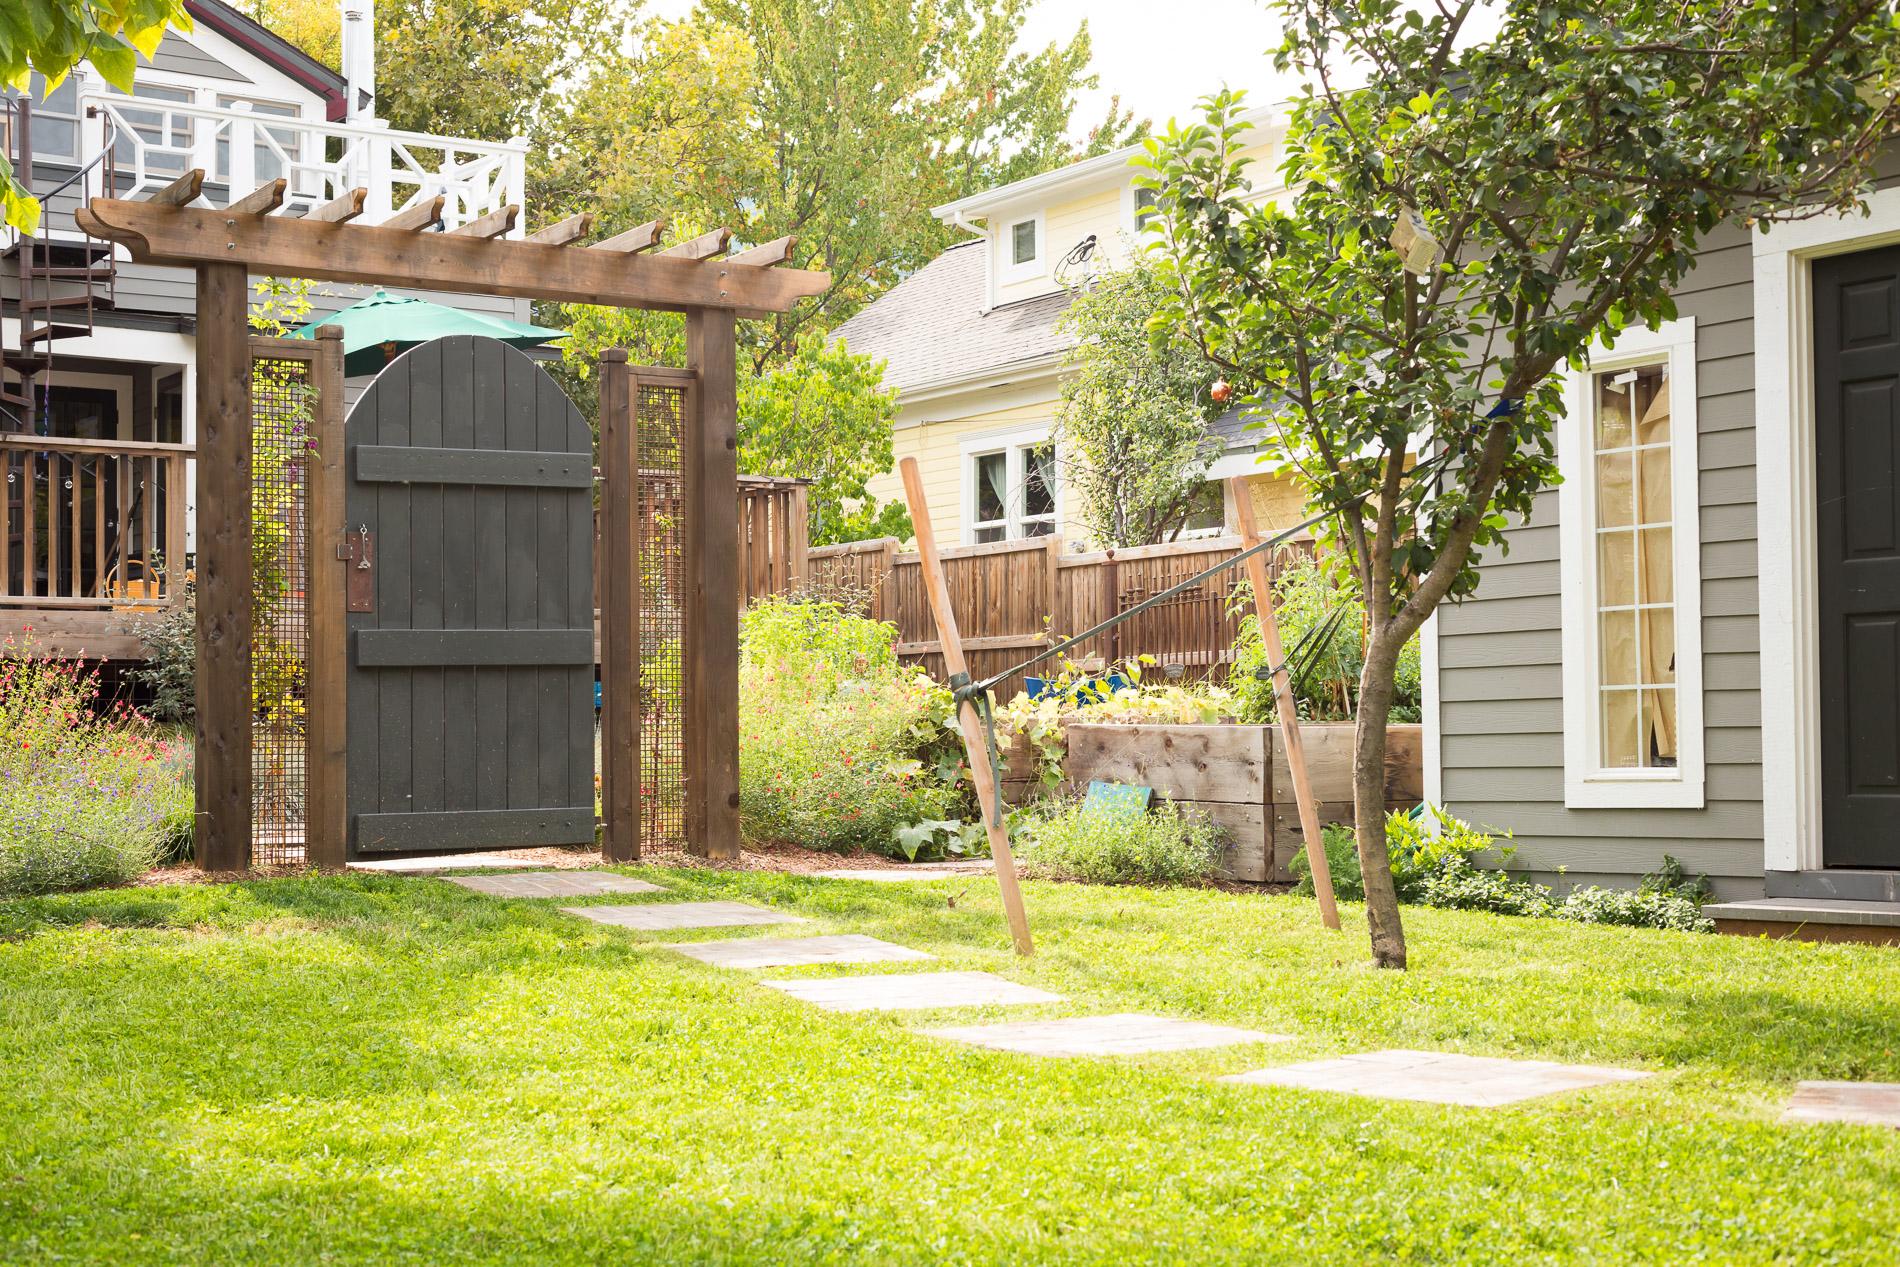 Ornamental Gate Arbor + segmented brick pathway + Eco-Lawn